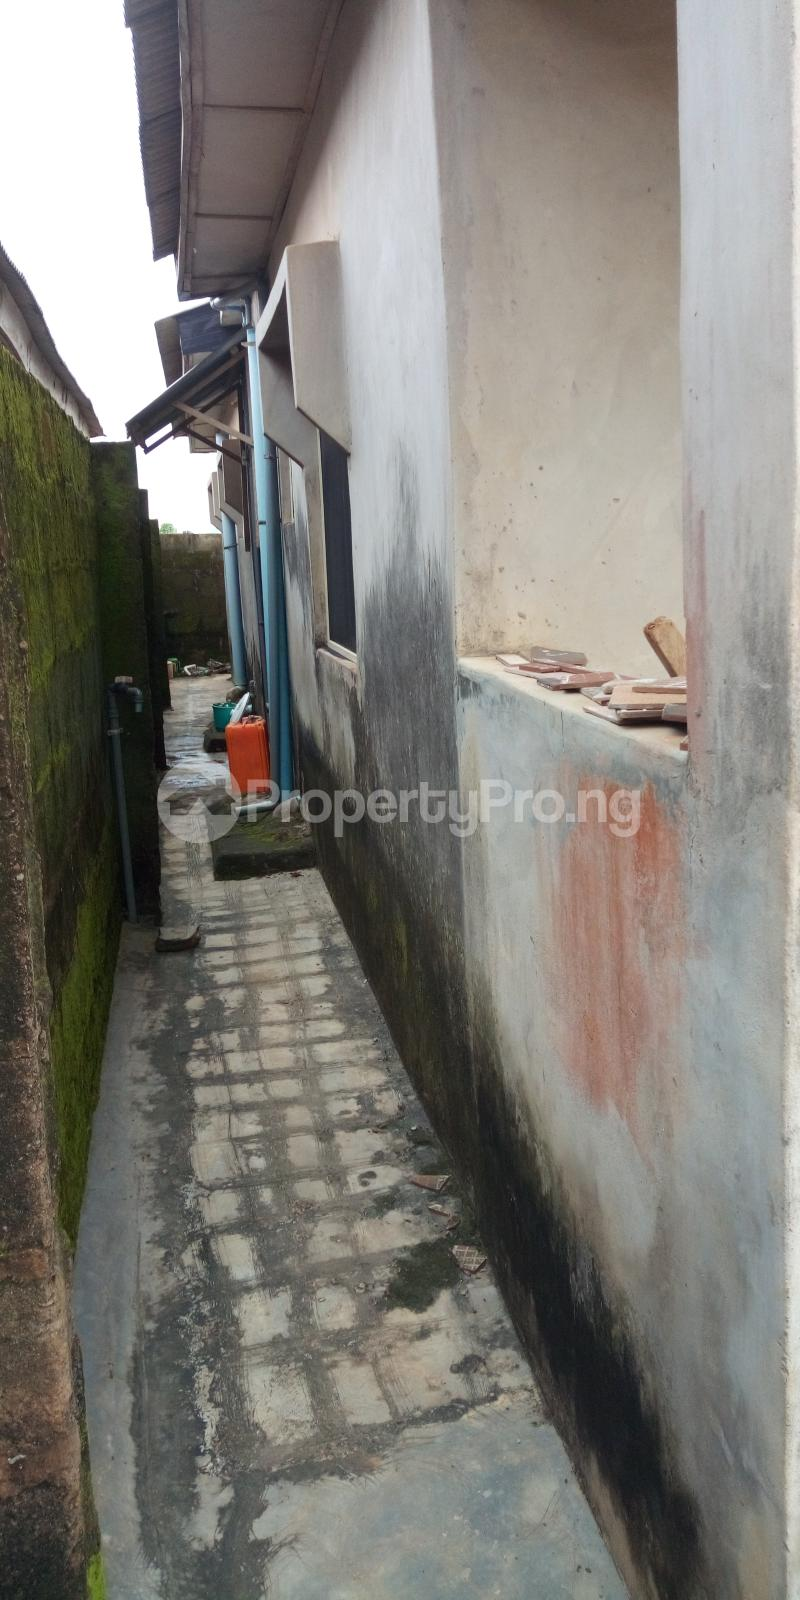 3 bedroom Detached Bungalow House for sale Kola command rd, Ipaja road Lagos  Ipaja road Ipaja Lagos - 5